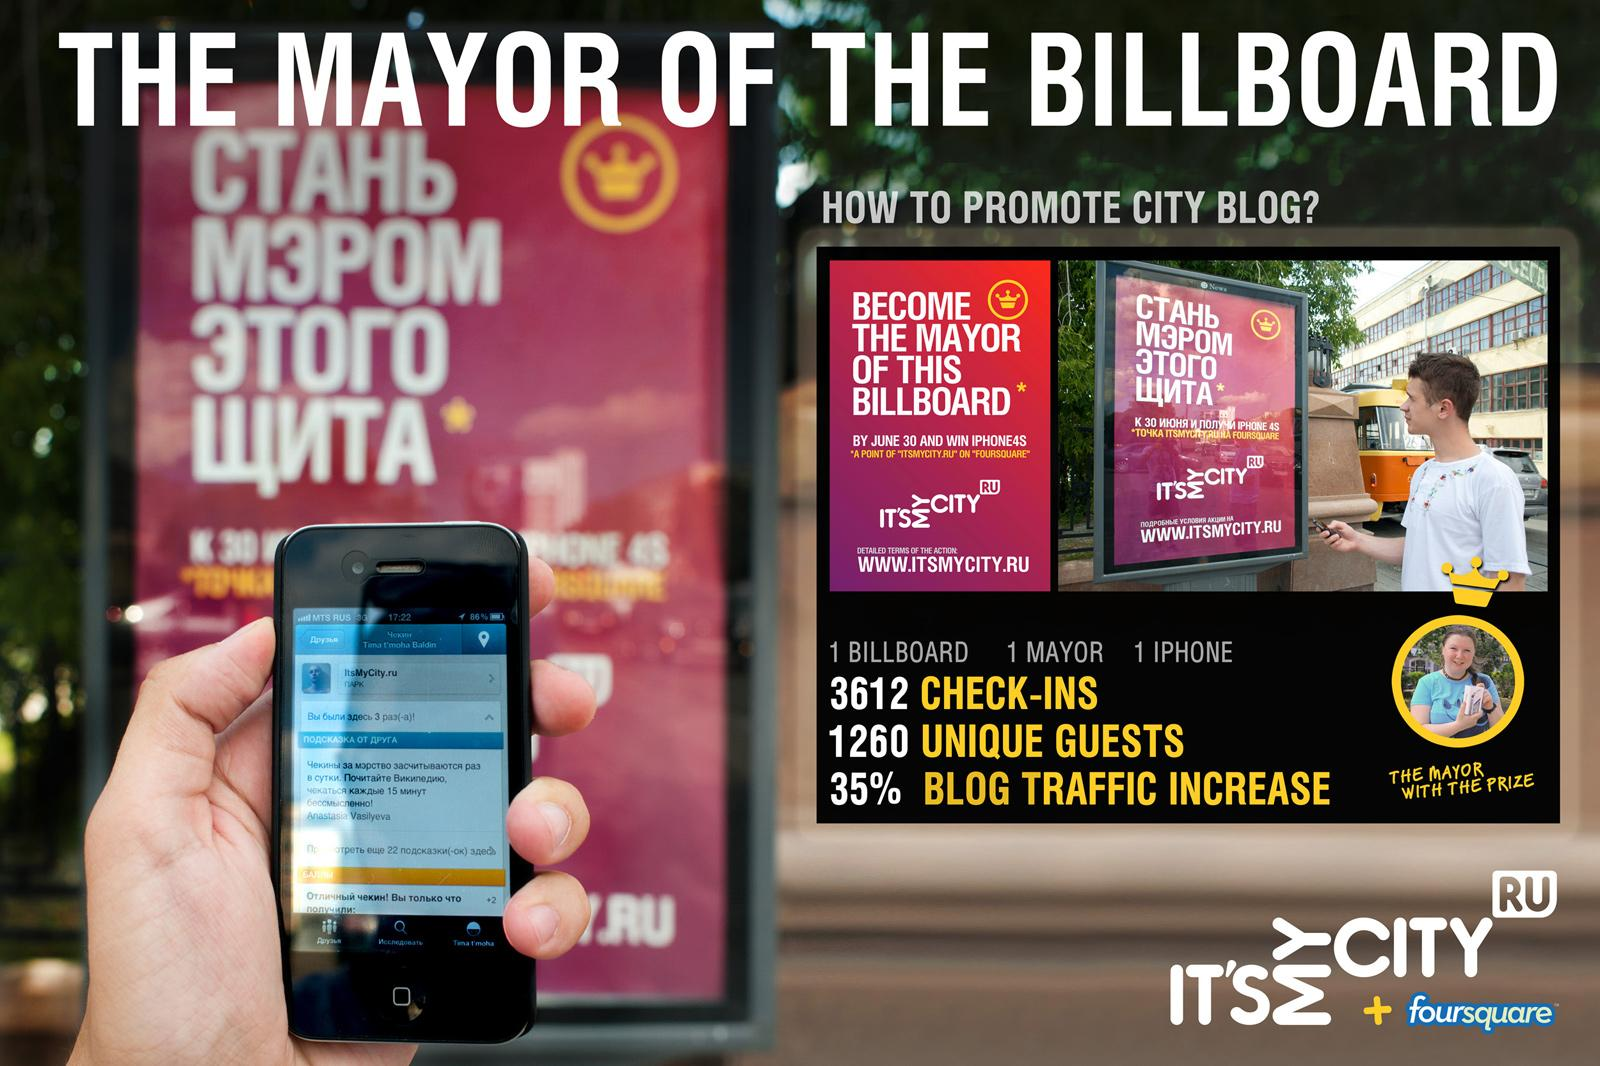 ItsMyCity.ru Outdoor Ad -  The Mayor Of Billboard